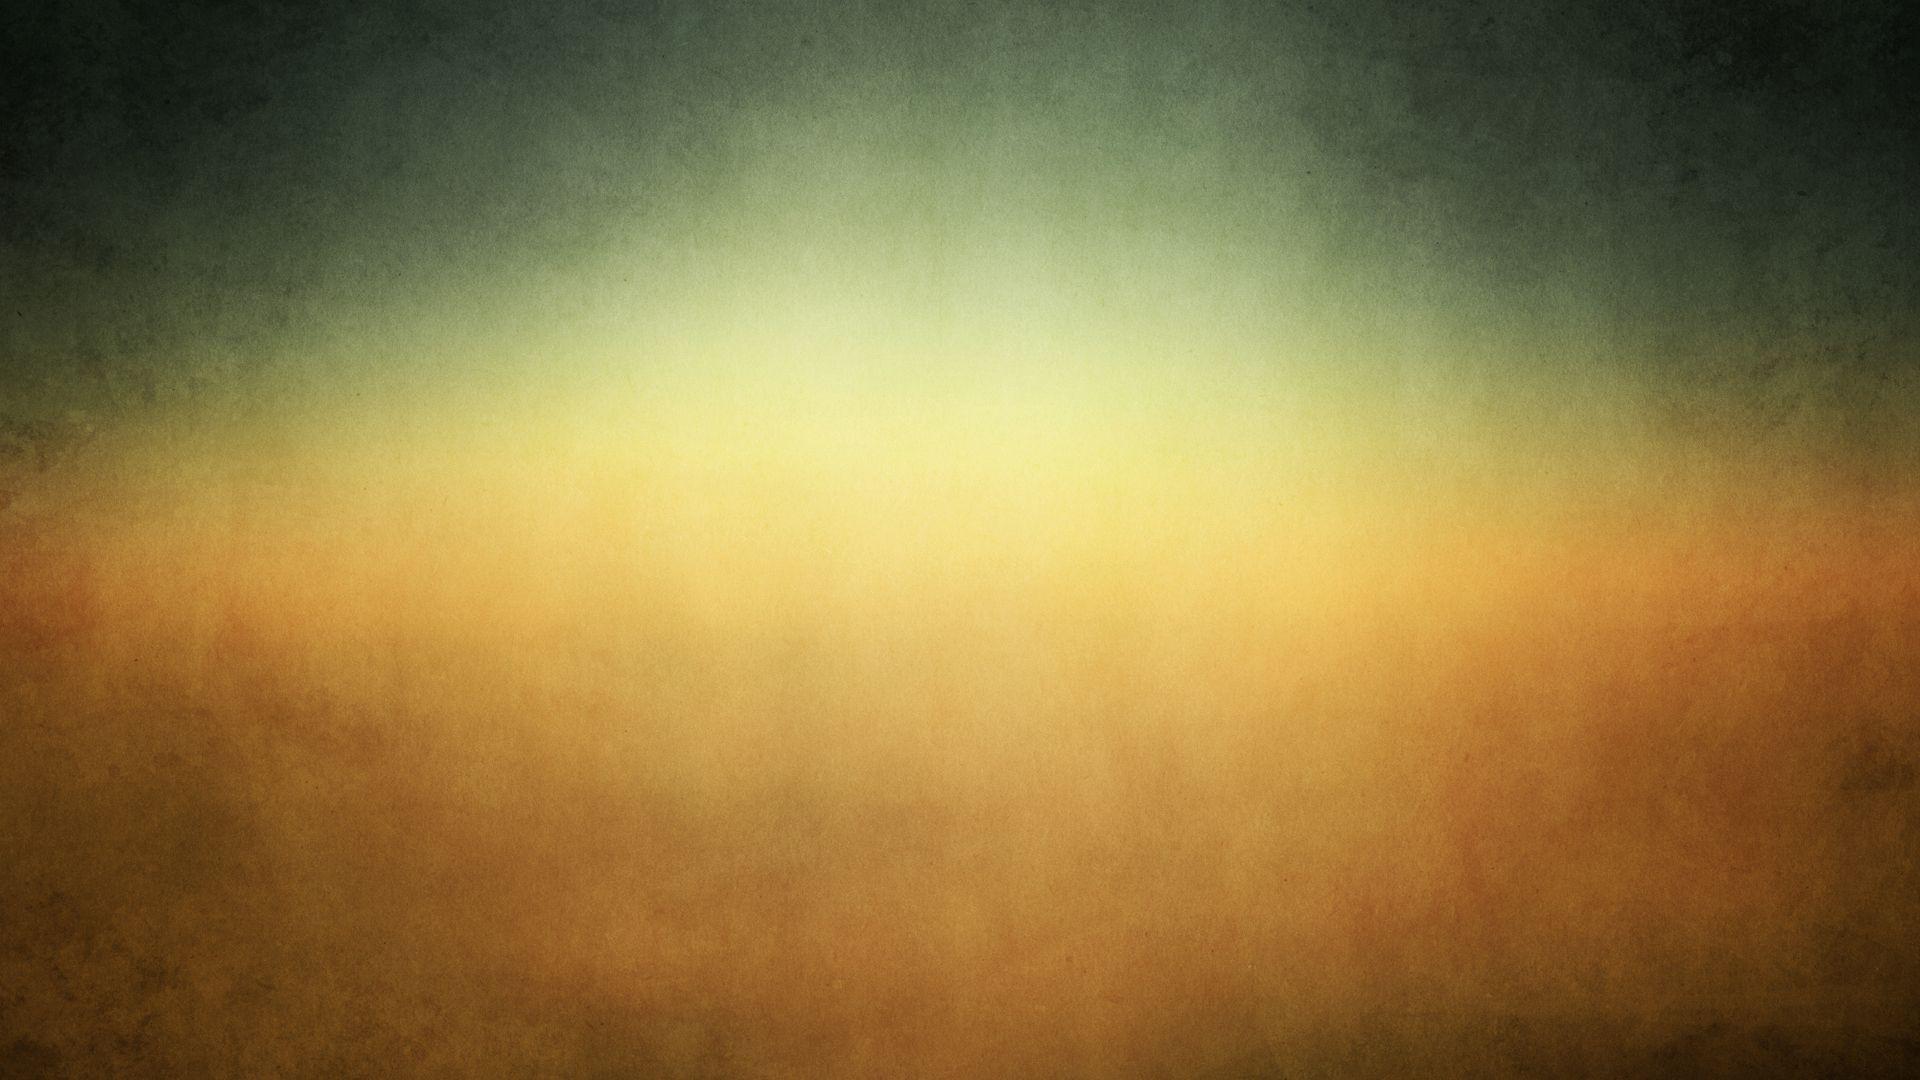 gradient-earth-tones-HD-Wallpapers.jpg (1920×1080) | Old paper ...